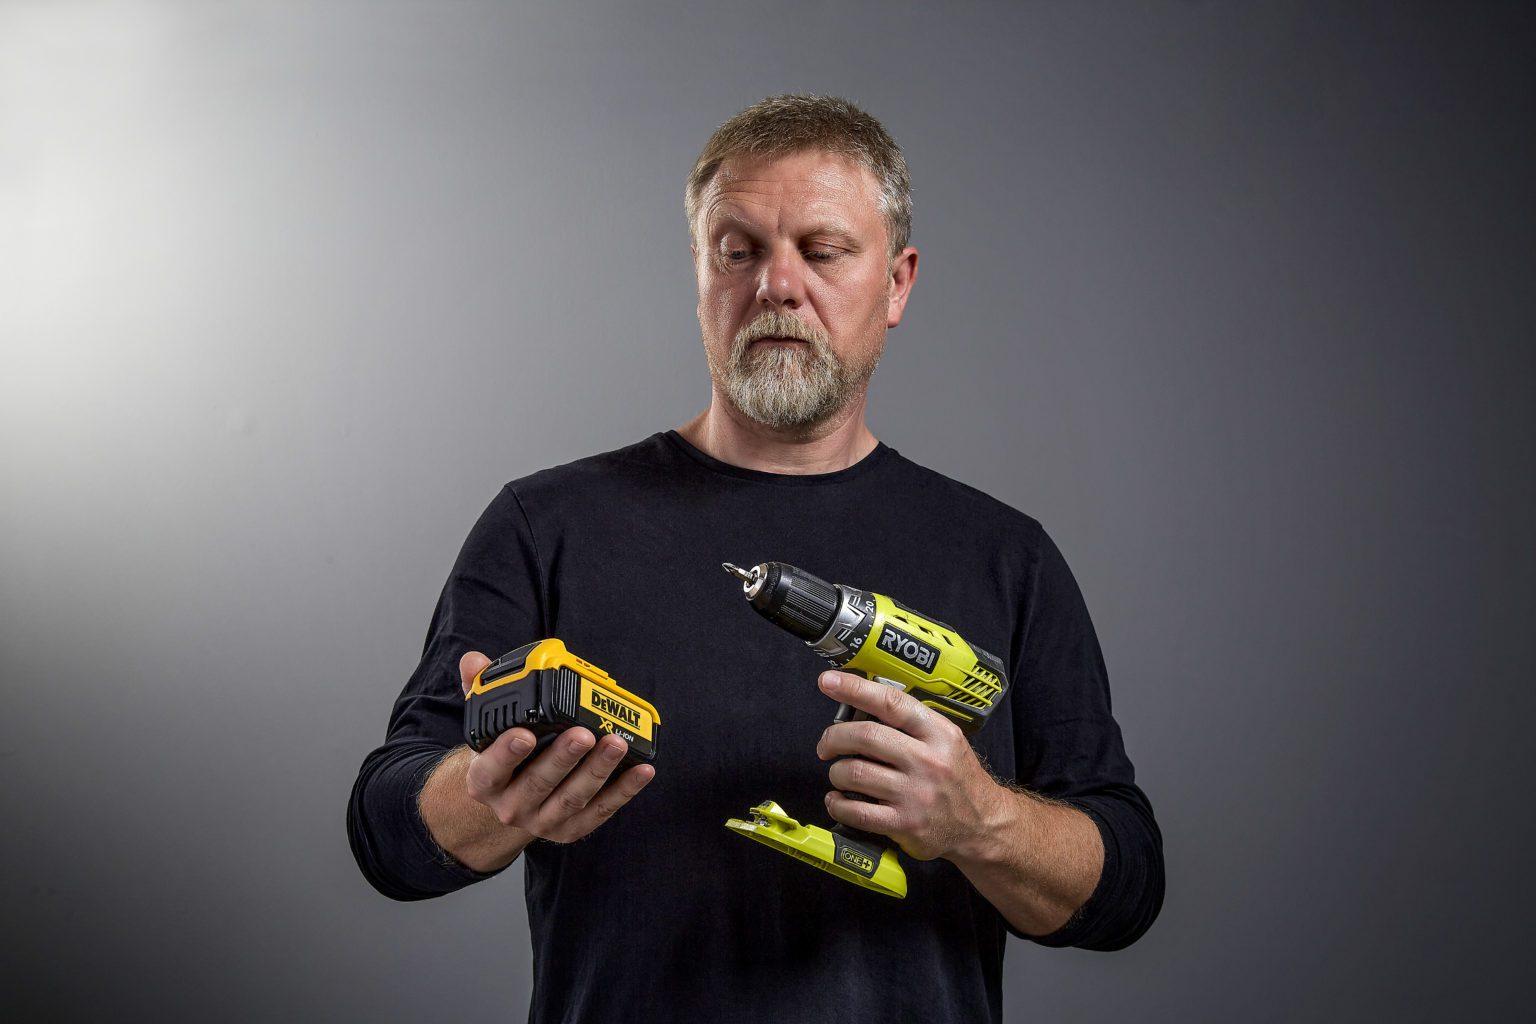 Man staring at DeWalt battery and Ryobi drill